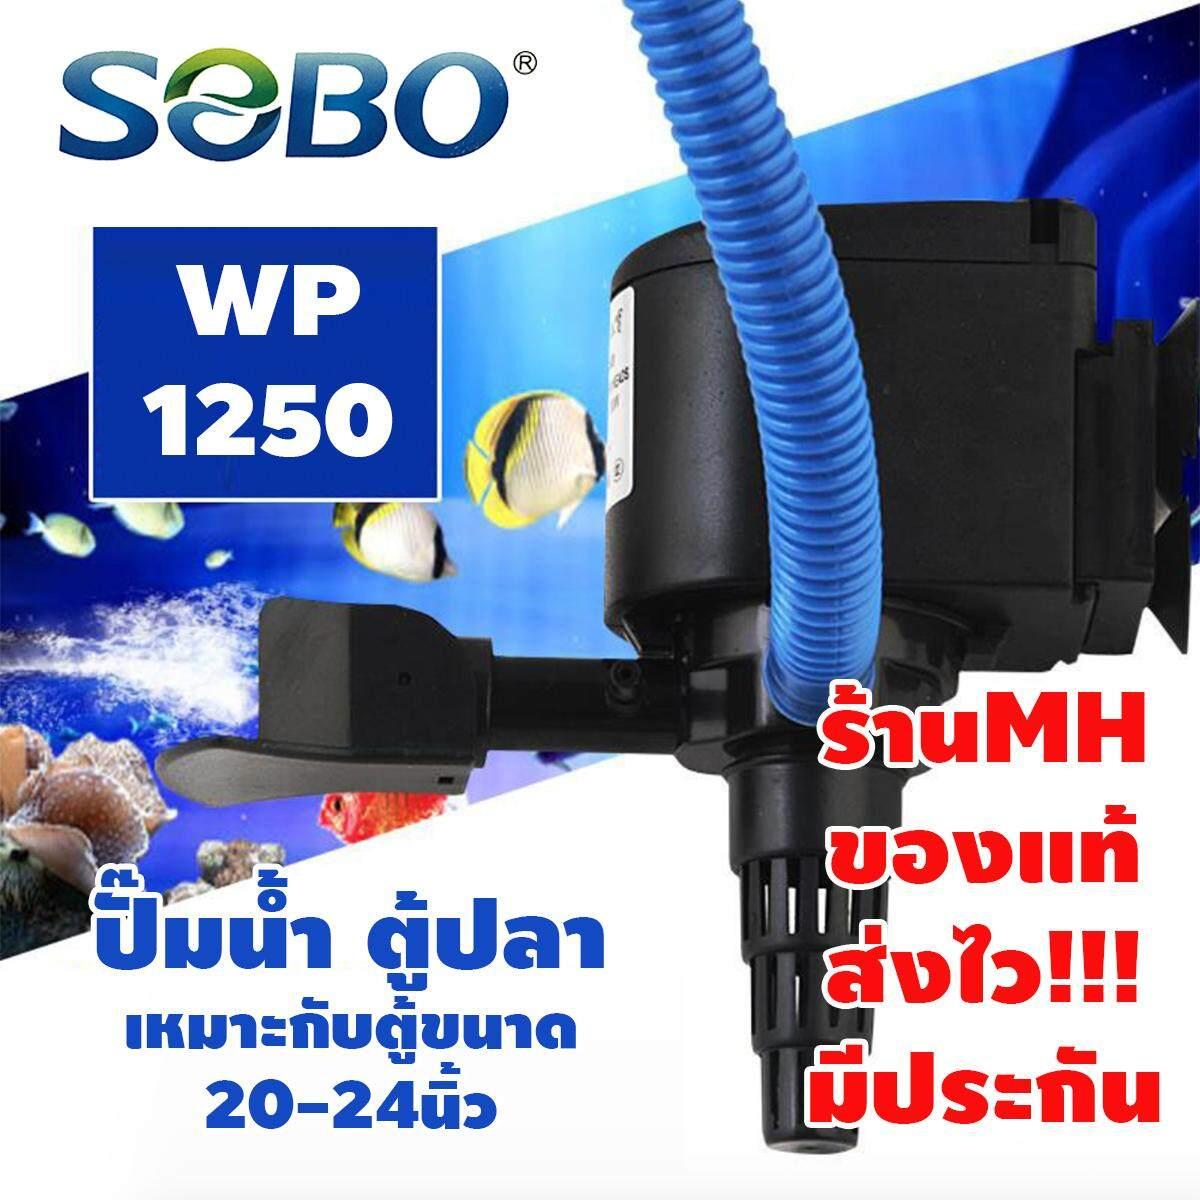 SOBO WP-1250 ปั้มน้ำตู้ปลา บ่อปลา กำลังไฟ 10w 800ลิตร/1ช.ม. WP1250 WP 1250 ปั๊มน้ำ ปั๊มแช่ ปั๊มน้ำพุ